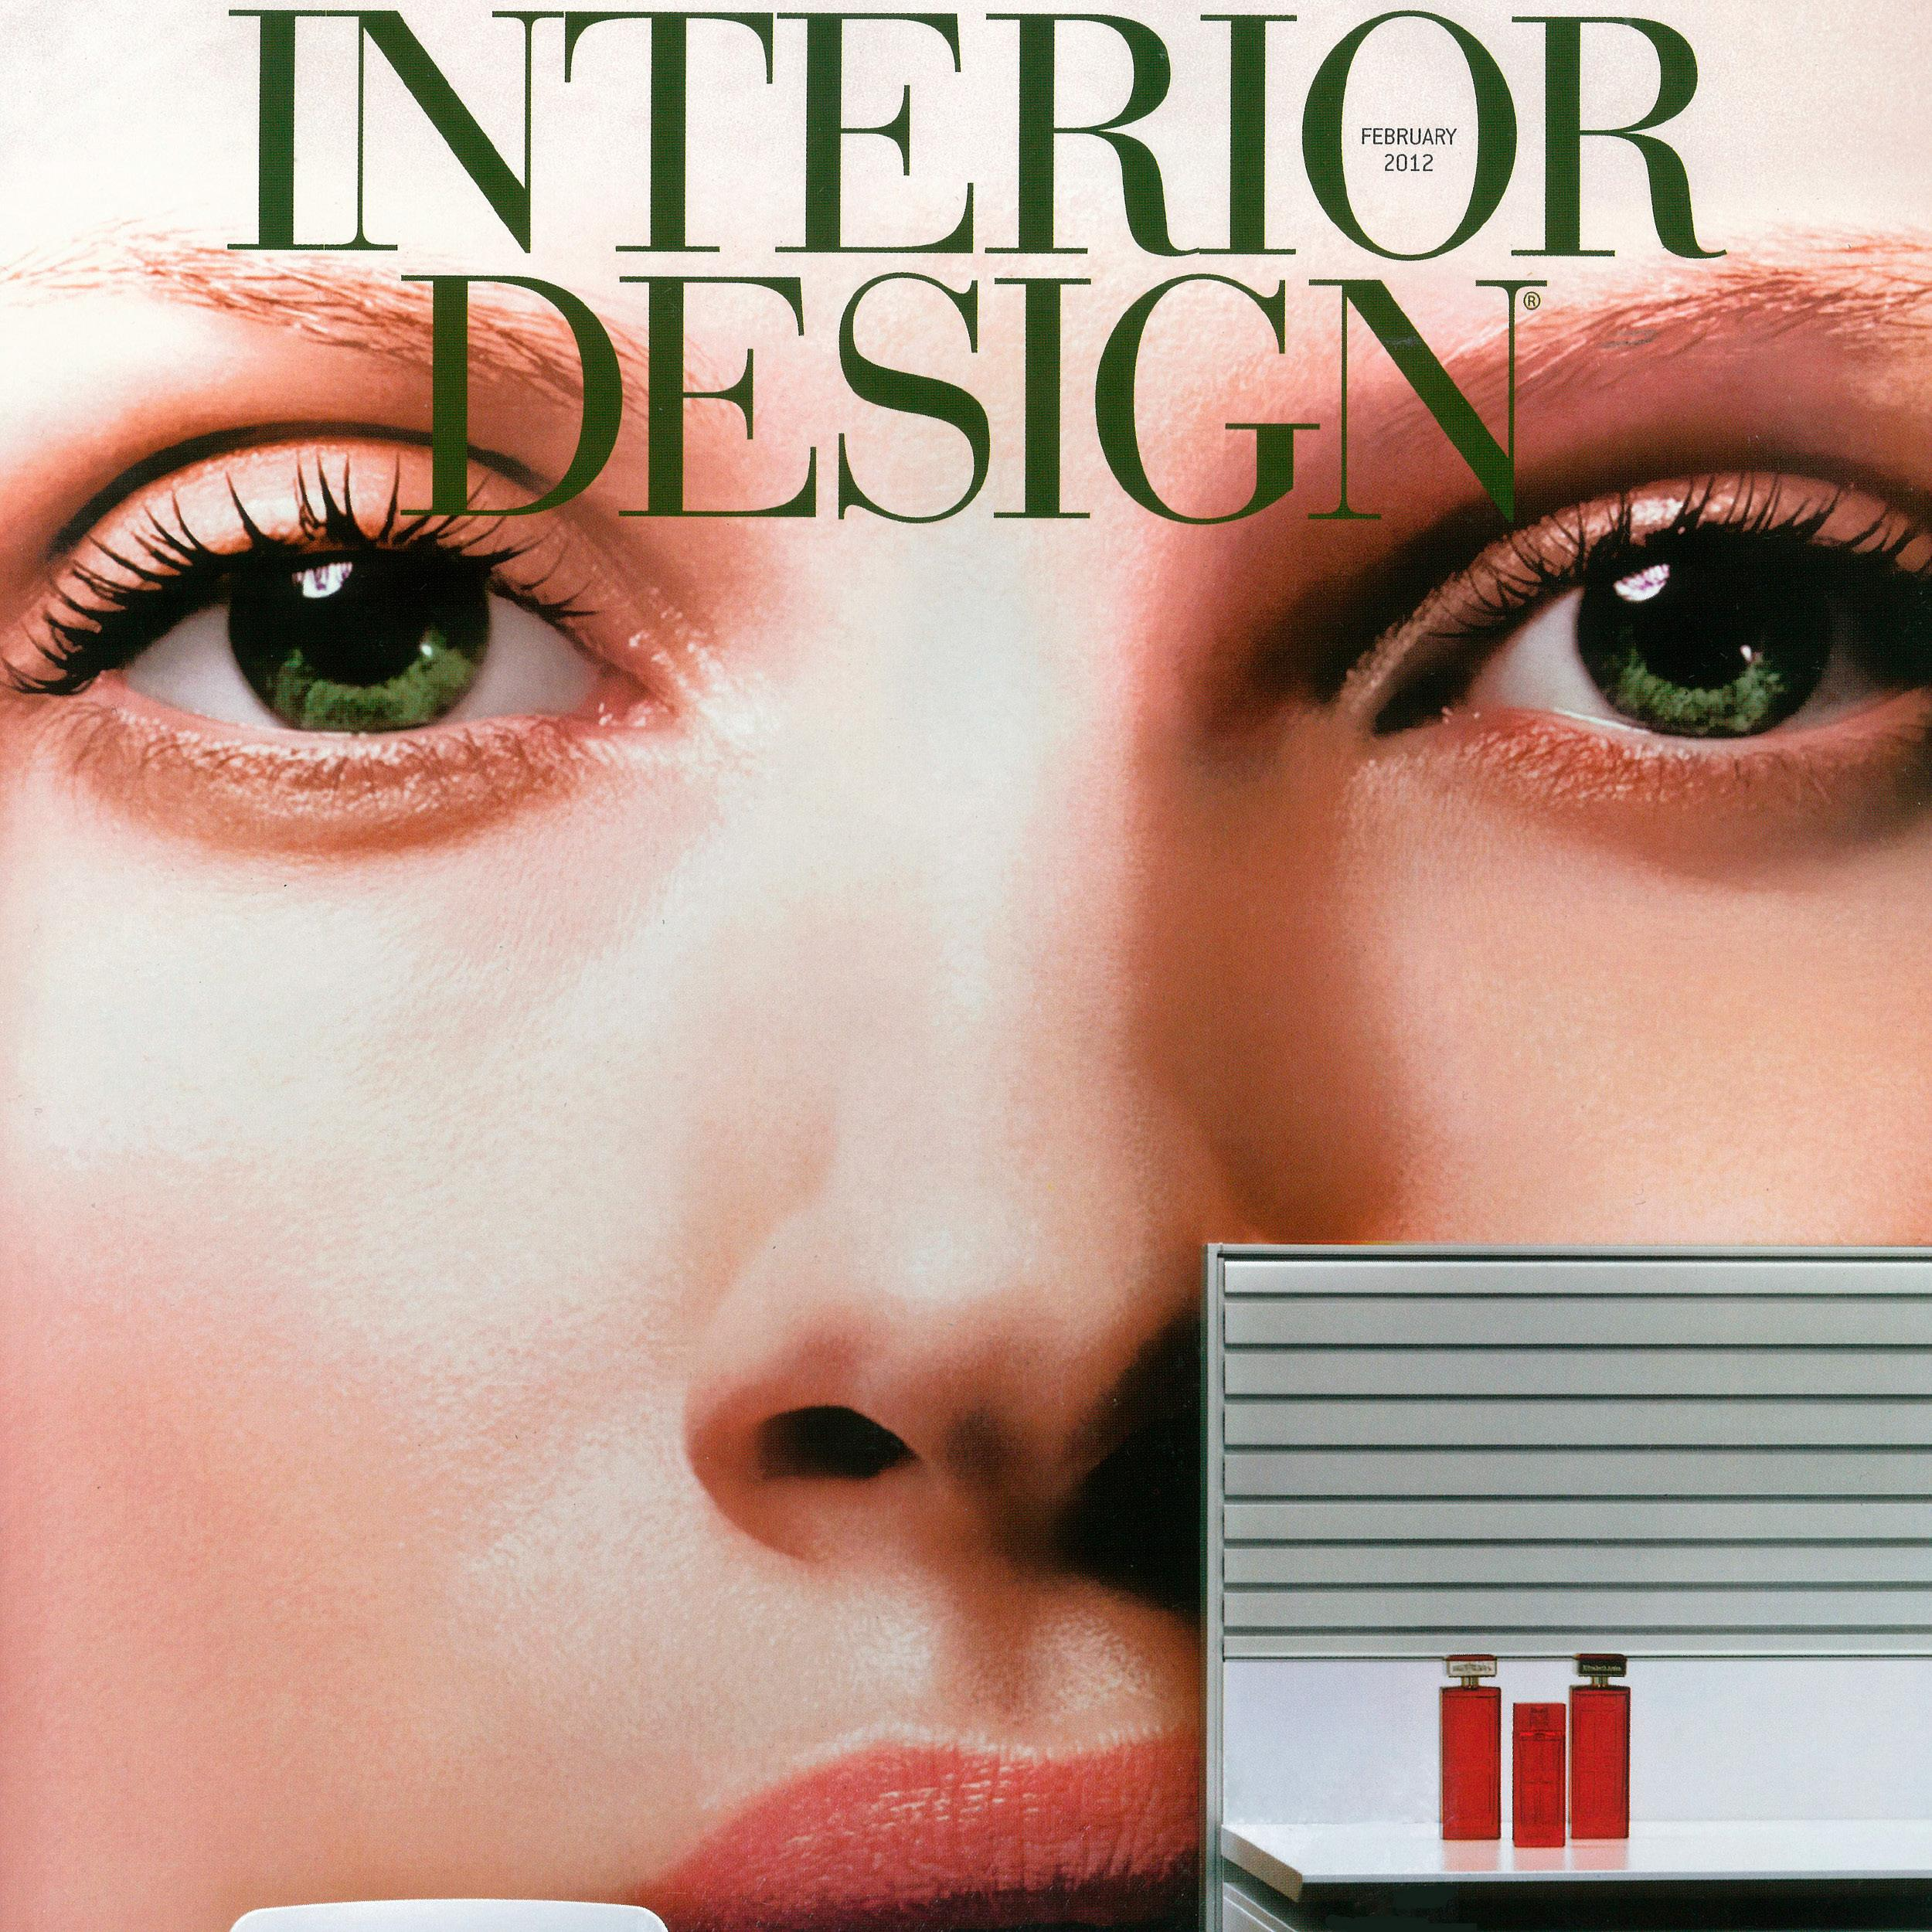 cover of Interior Design magazine February 2012 issue